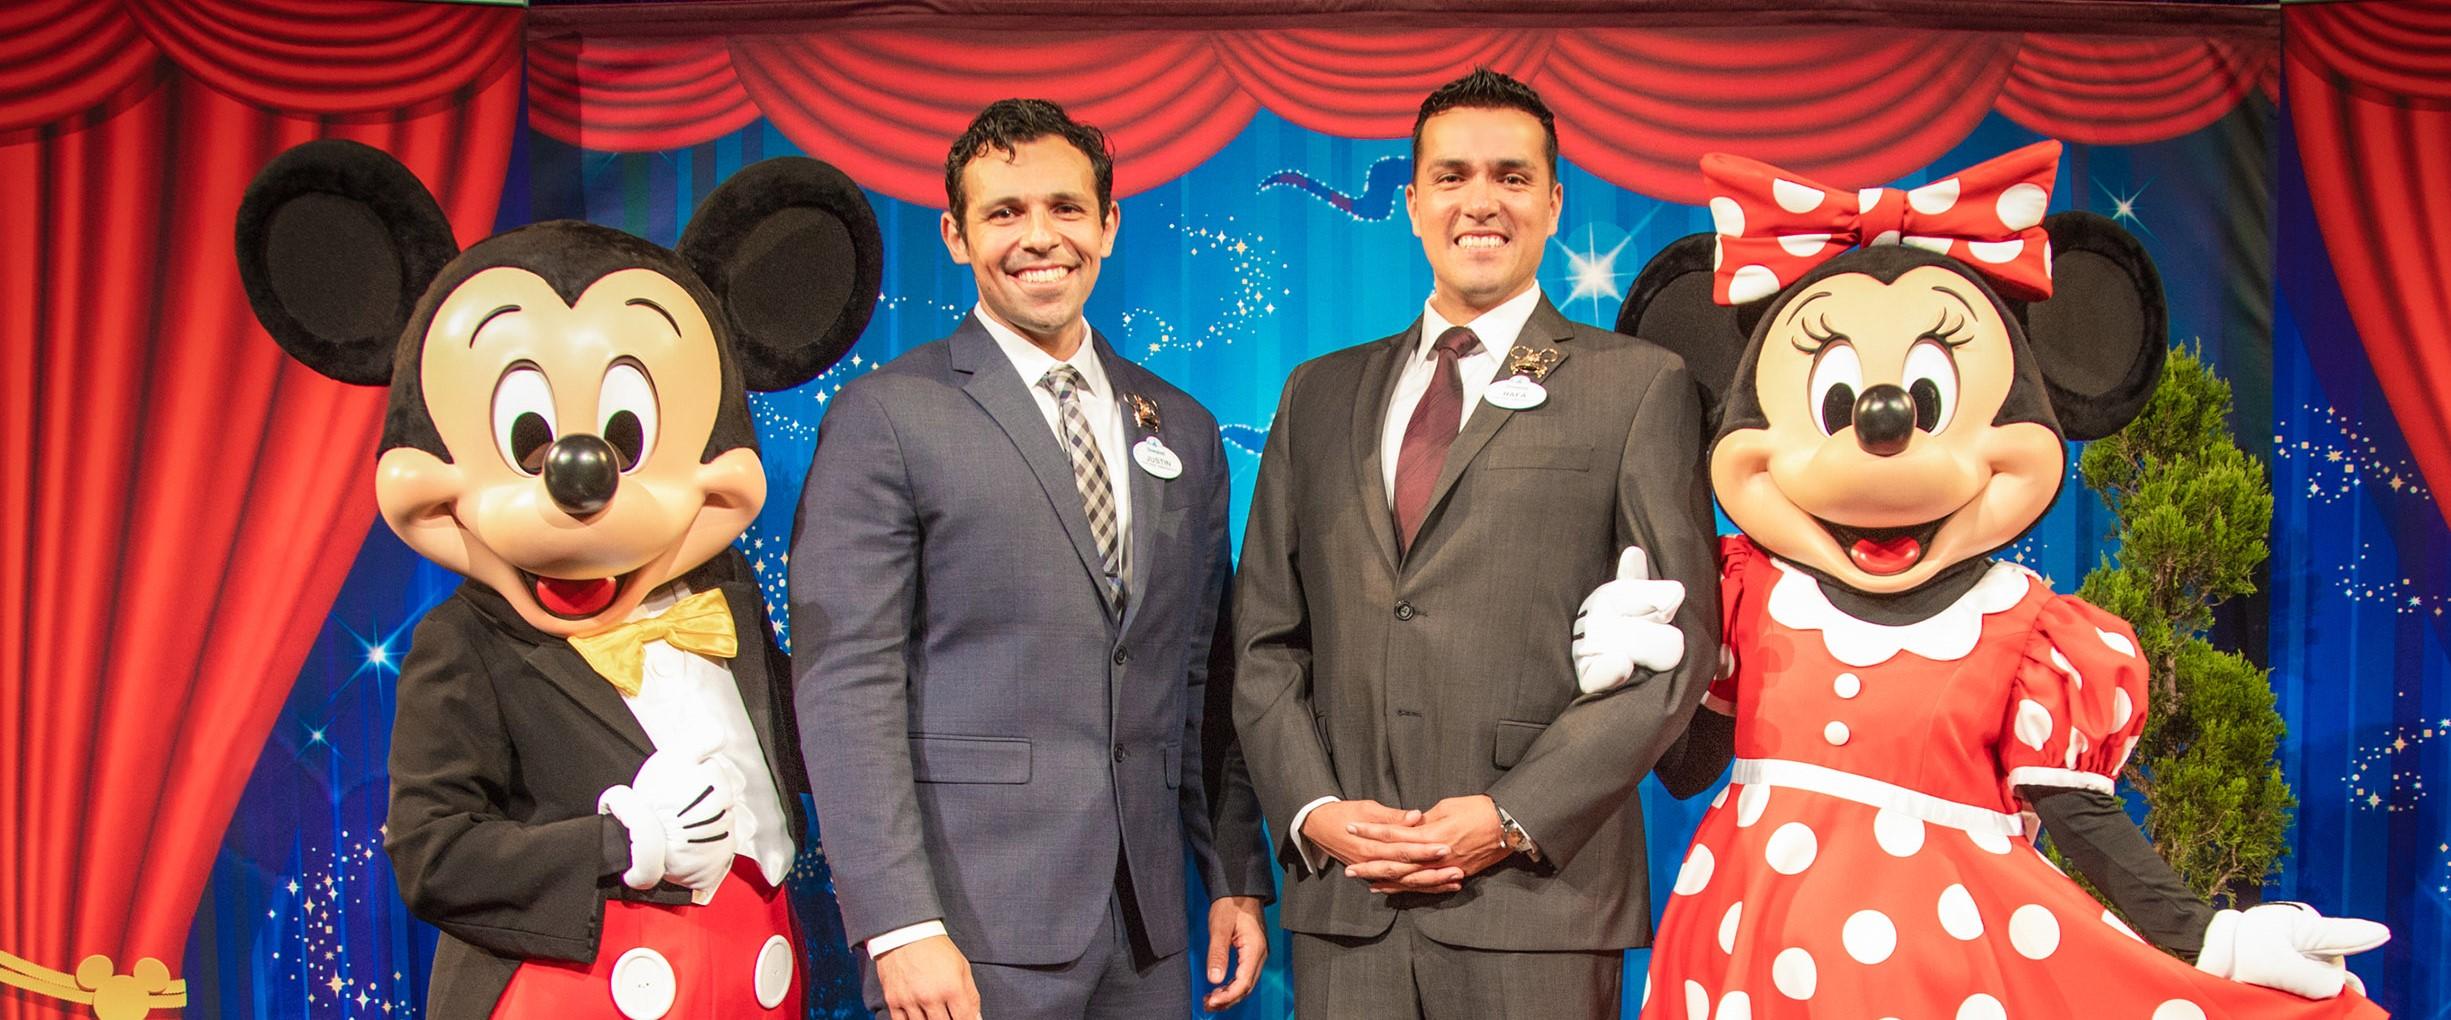 Disneyland Resort 2019-2020 Ambassador Team In a tradition dating back to 1965, Disneyland Resort President Josh D'Amaro announced that cast members Justin Rapp and Rafa Barron will represent the Disneyland Resort and its 30,000 cast members as the 2019-2020 Disney Ambassadors. (Disneyland Resort)